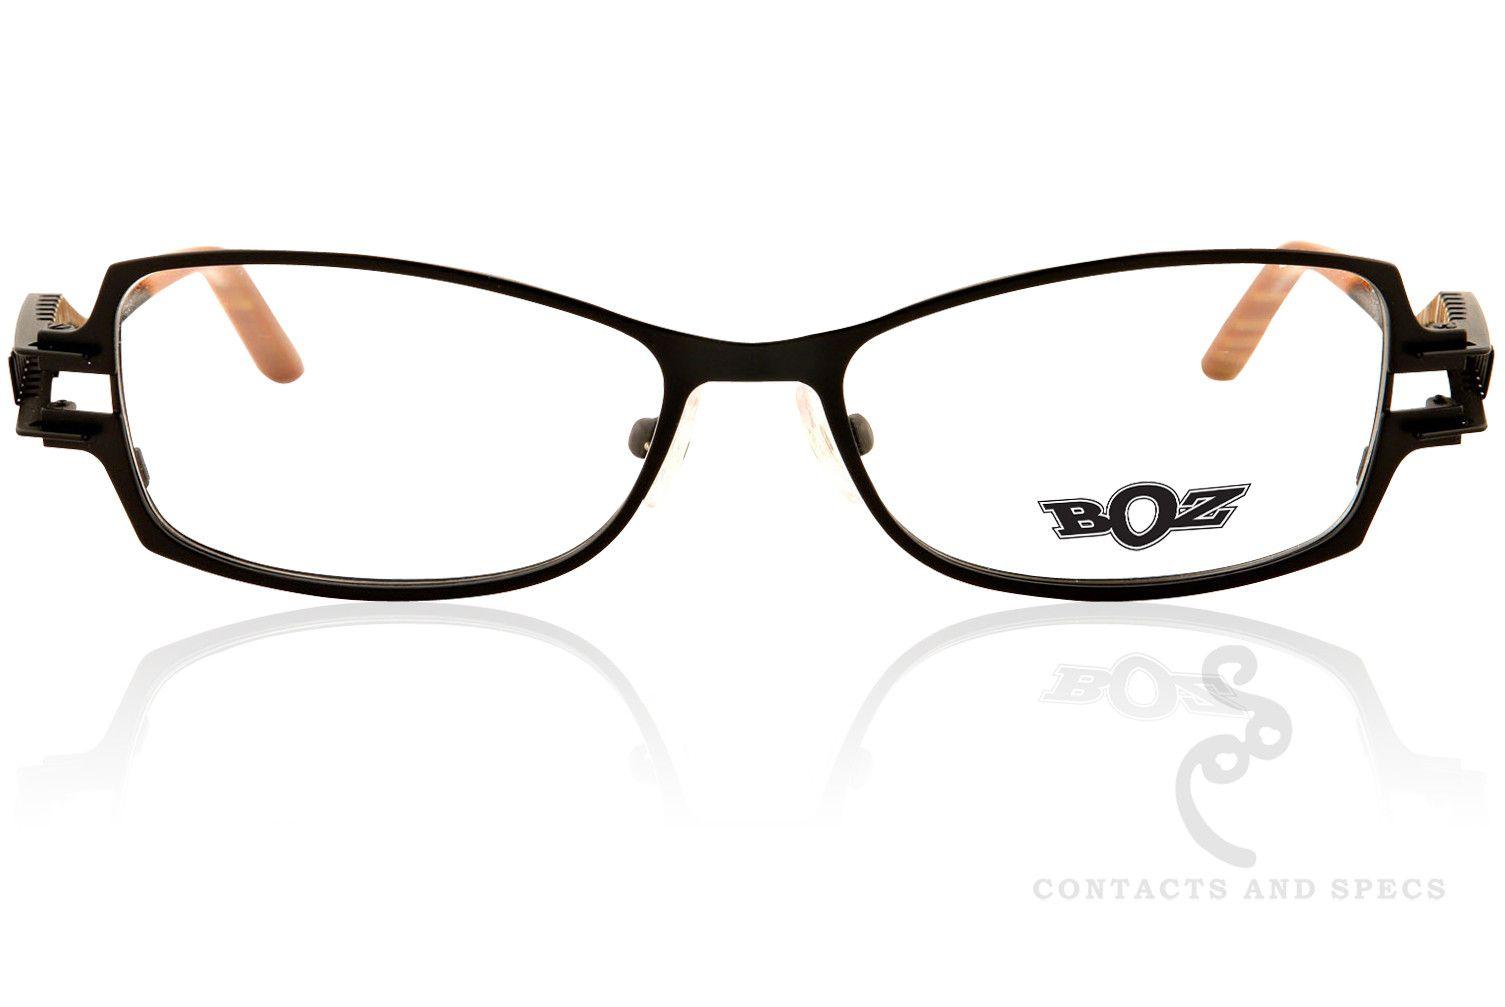 Boz Eyewear Lipstick